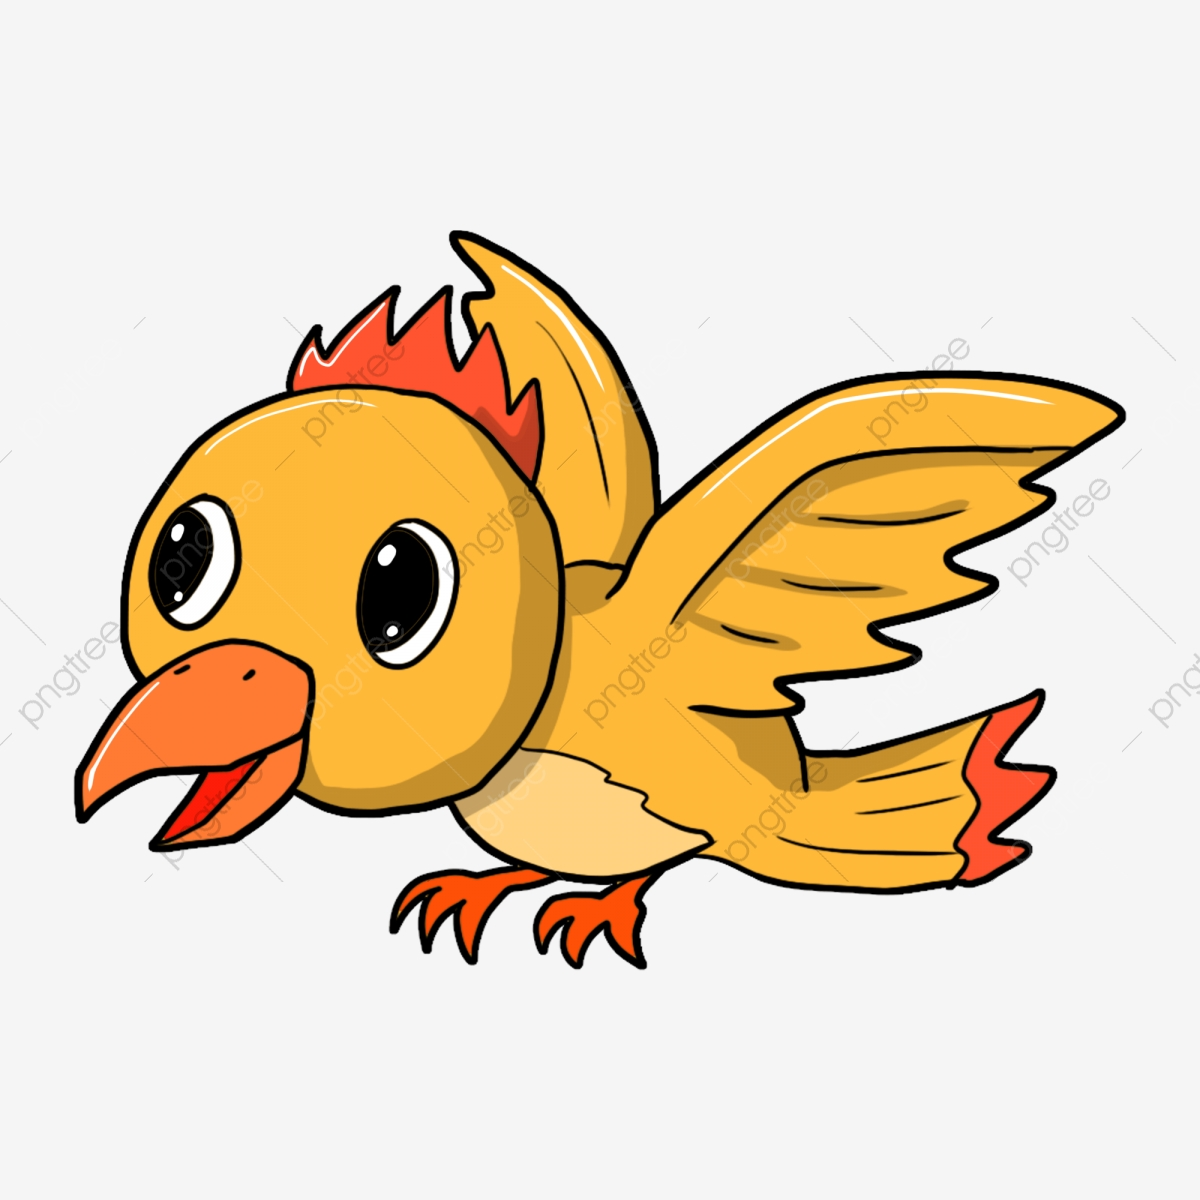 pngtree cute bird flight wing cartoon birds png image 3865830